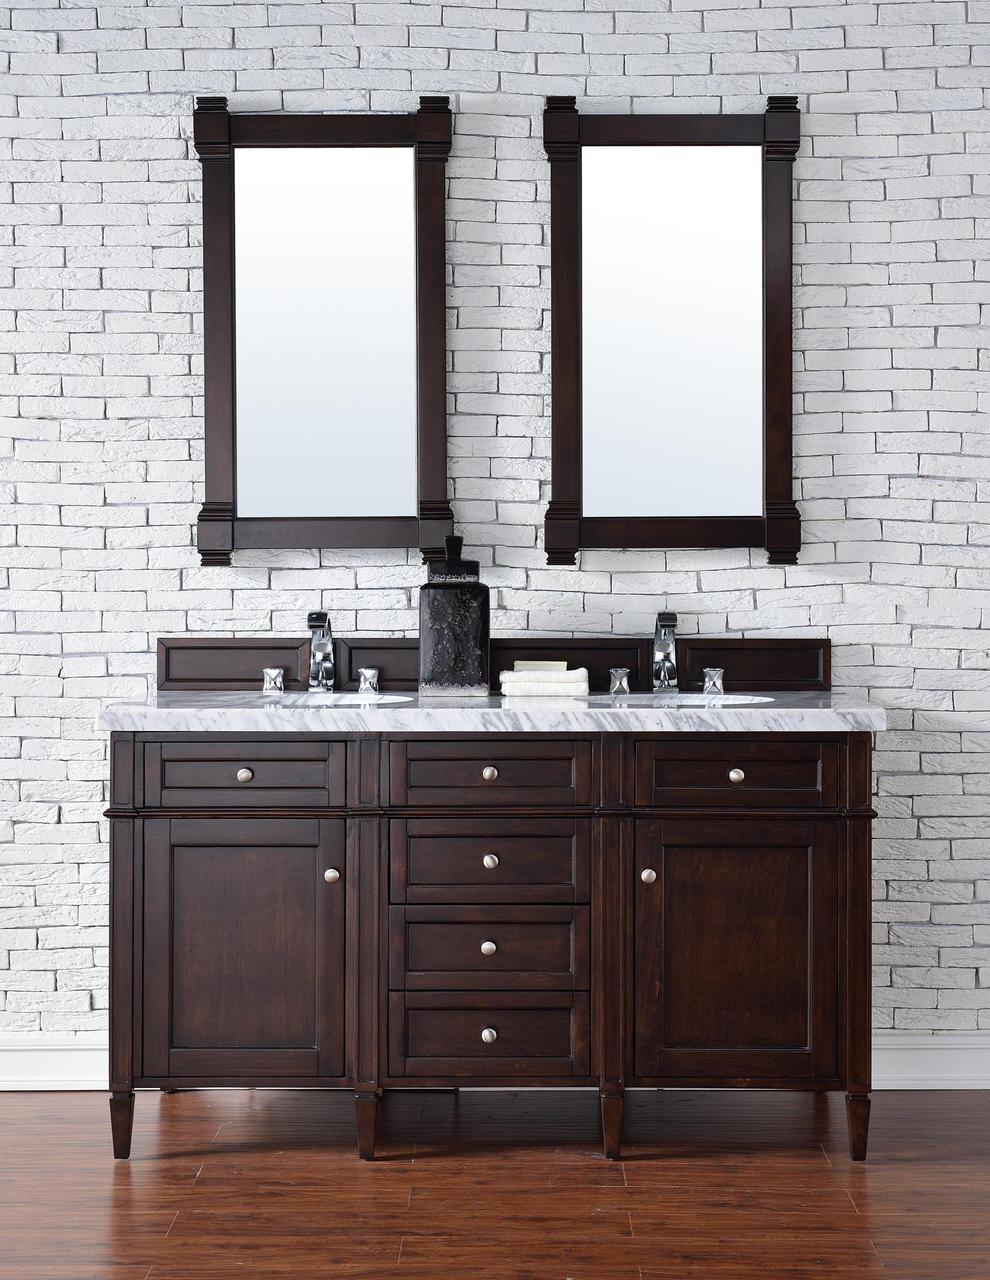 60 inch Double Sink Contemporary Bathroom Vanity Mahogany Finish Optional Tops